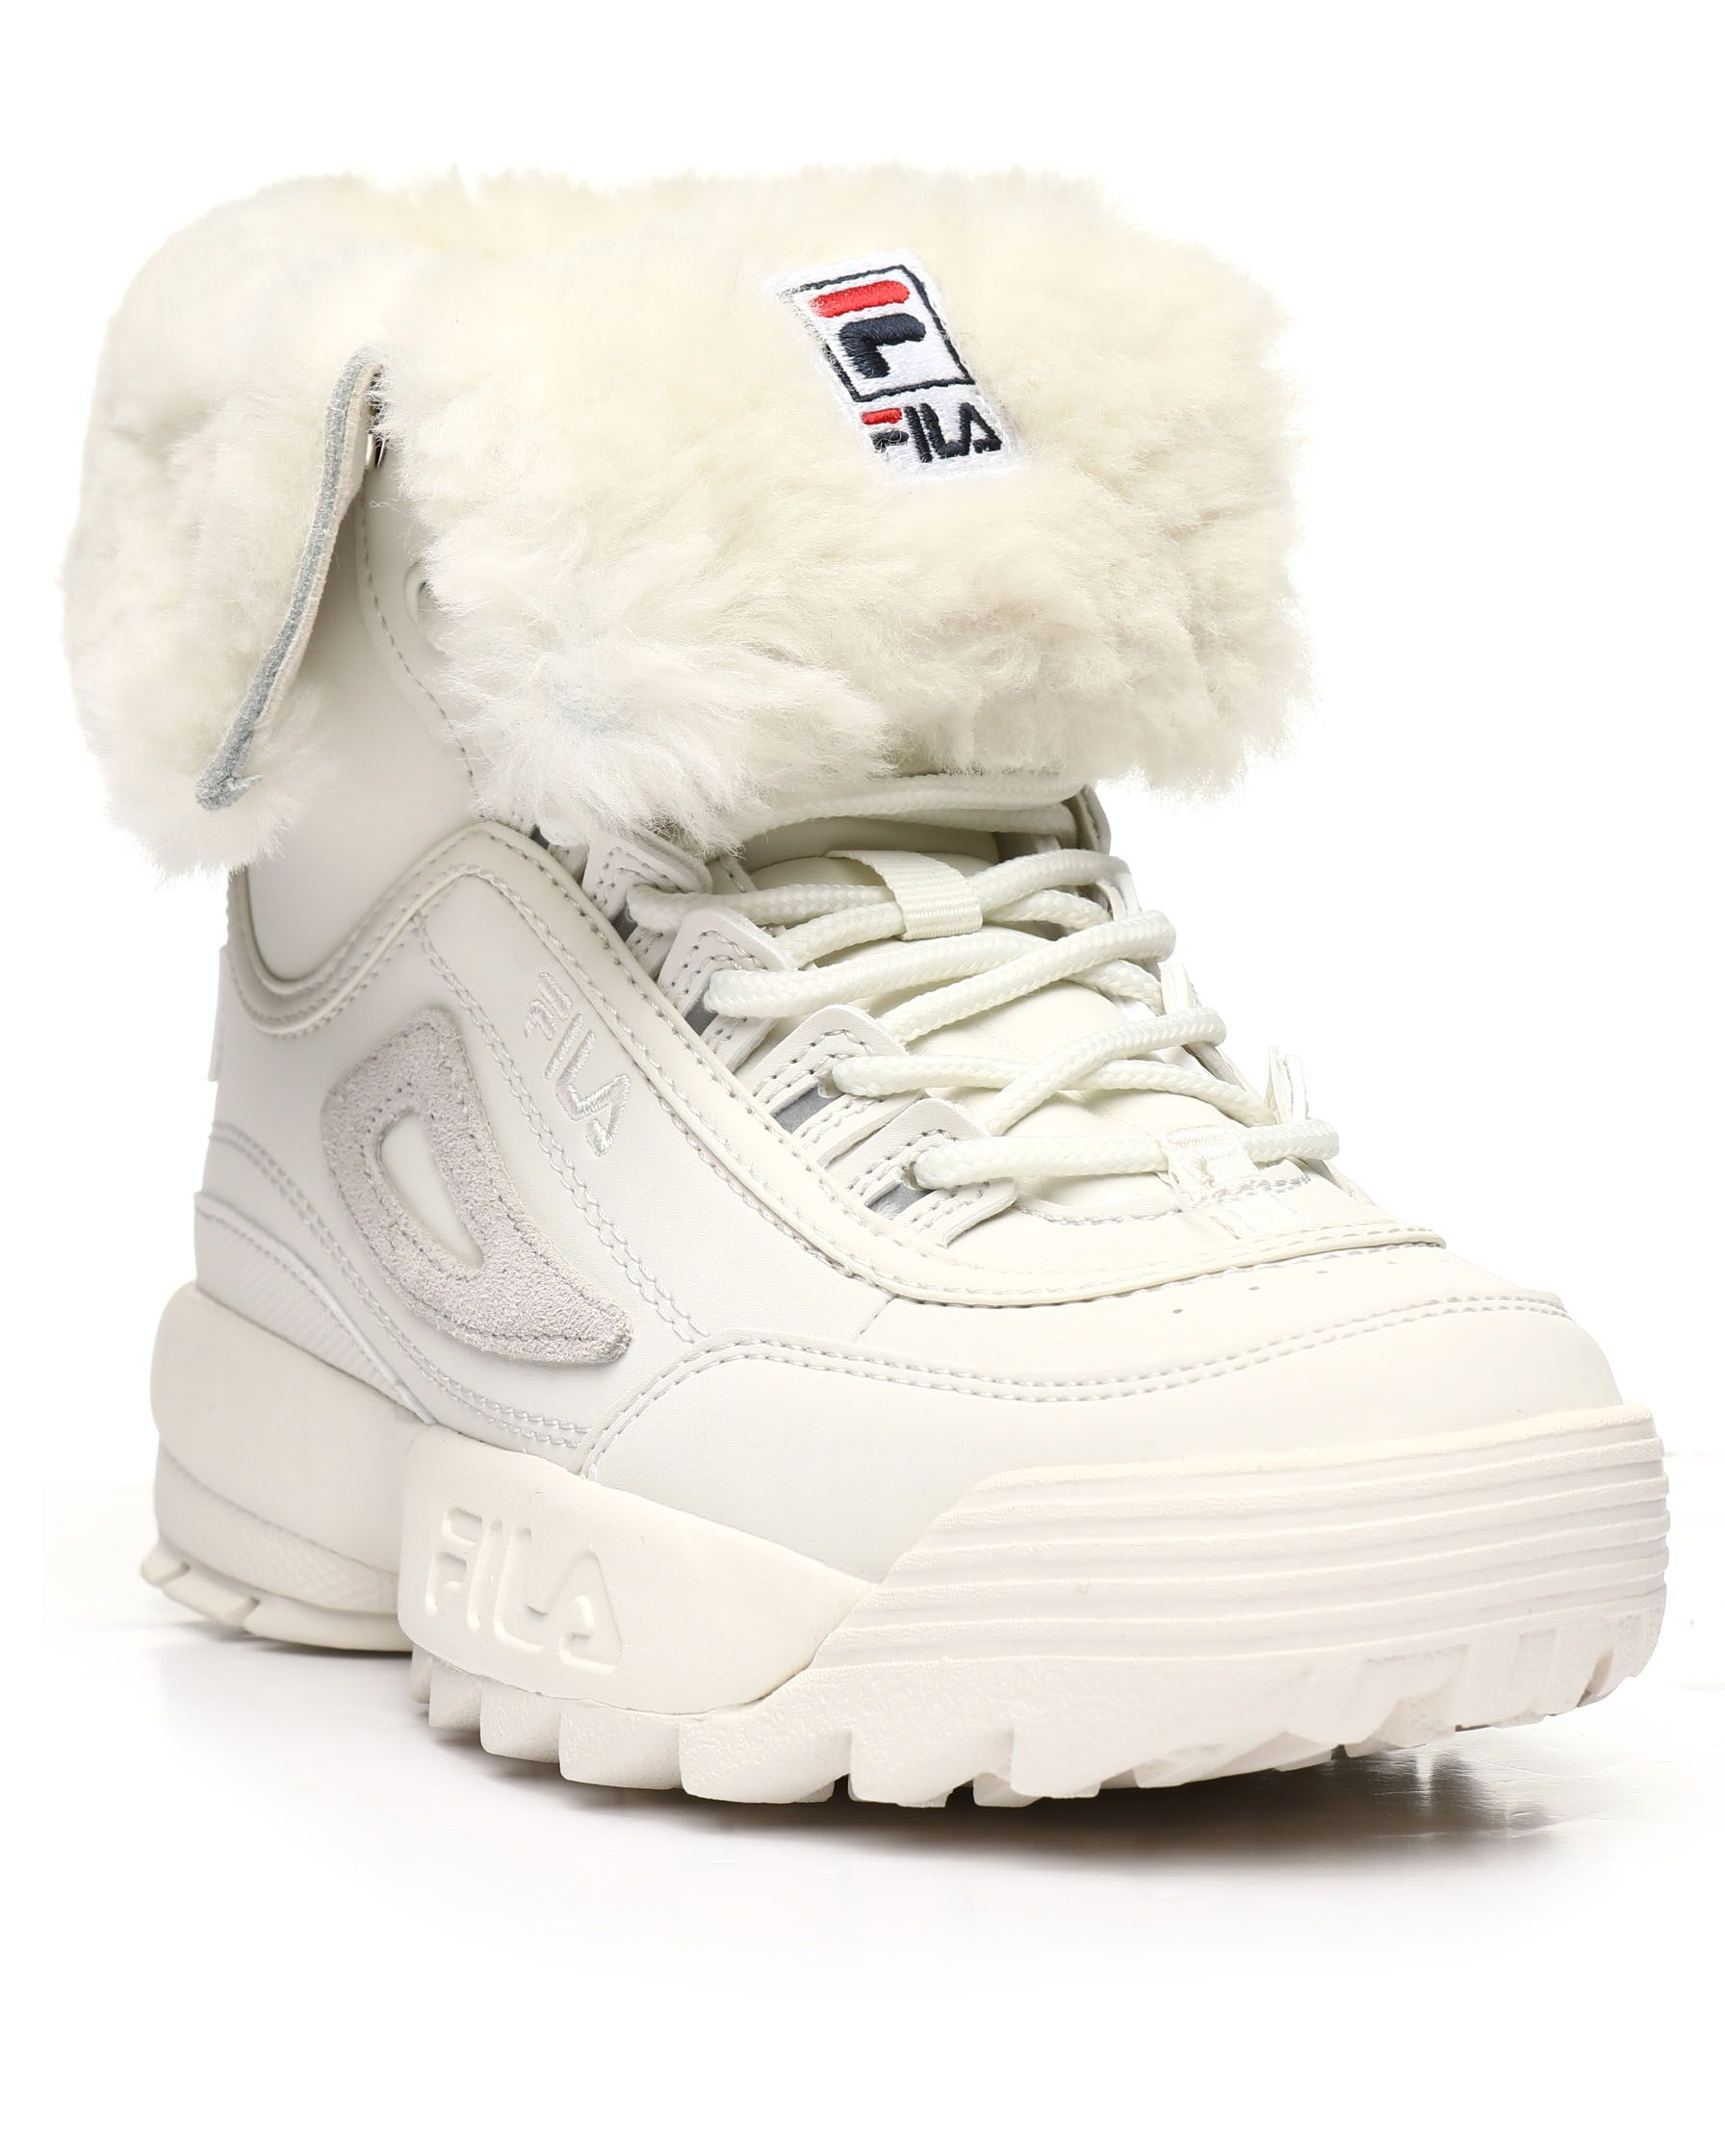 Disruptor Shearling Boots from Fila at